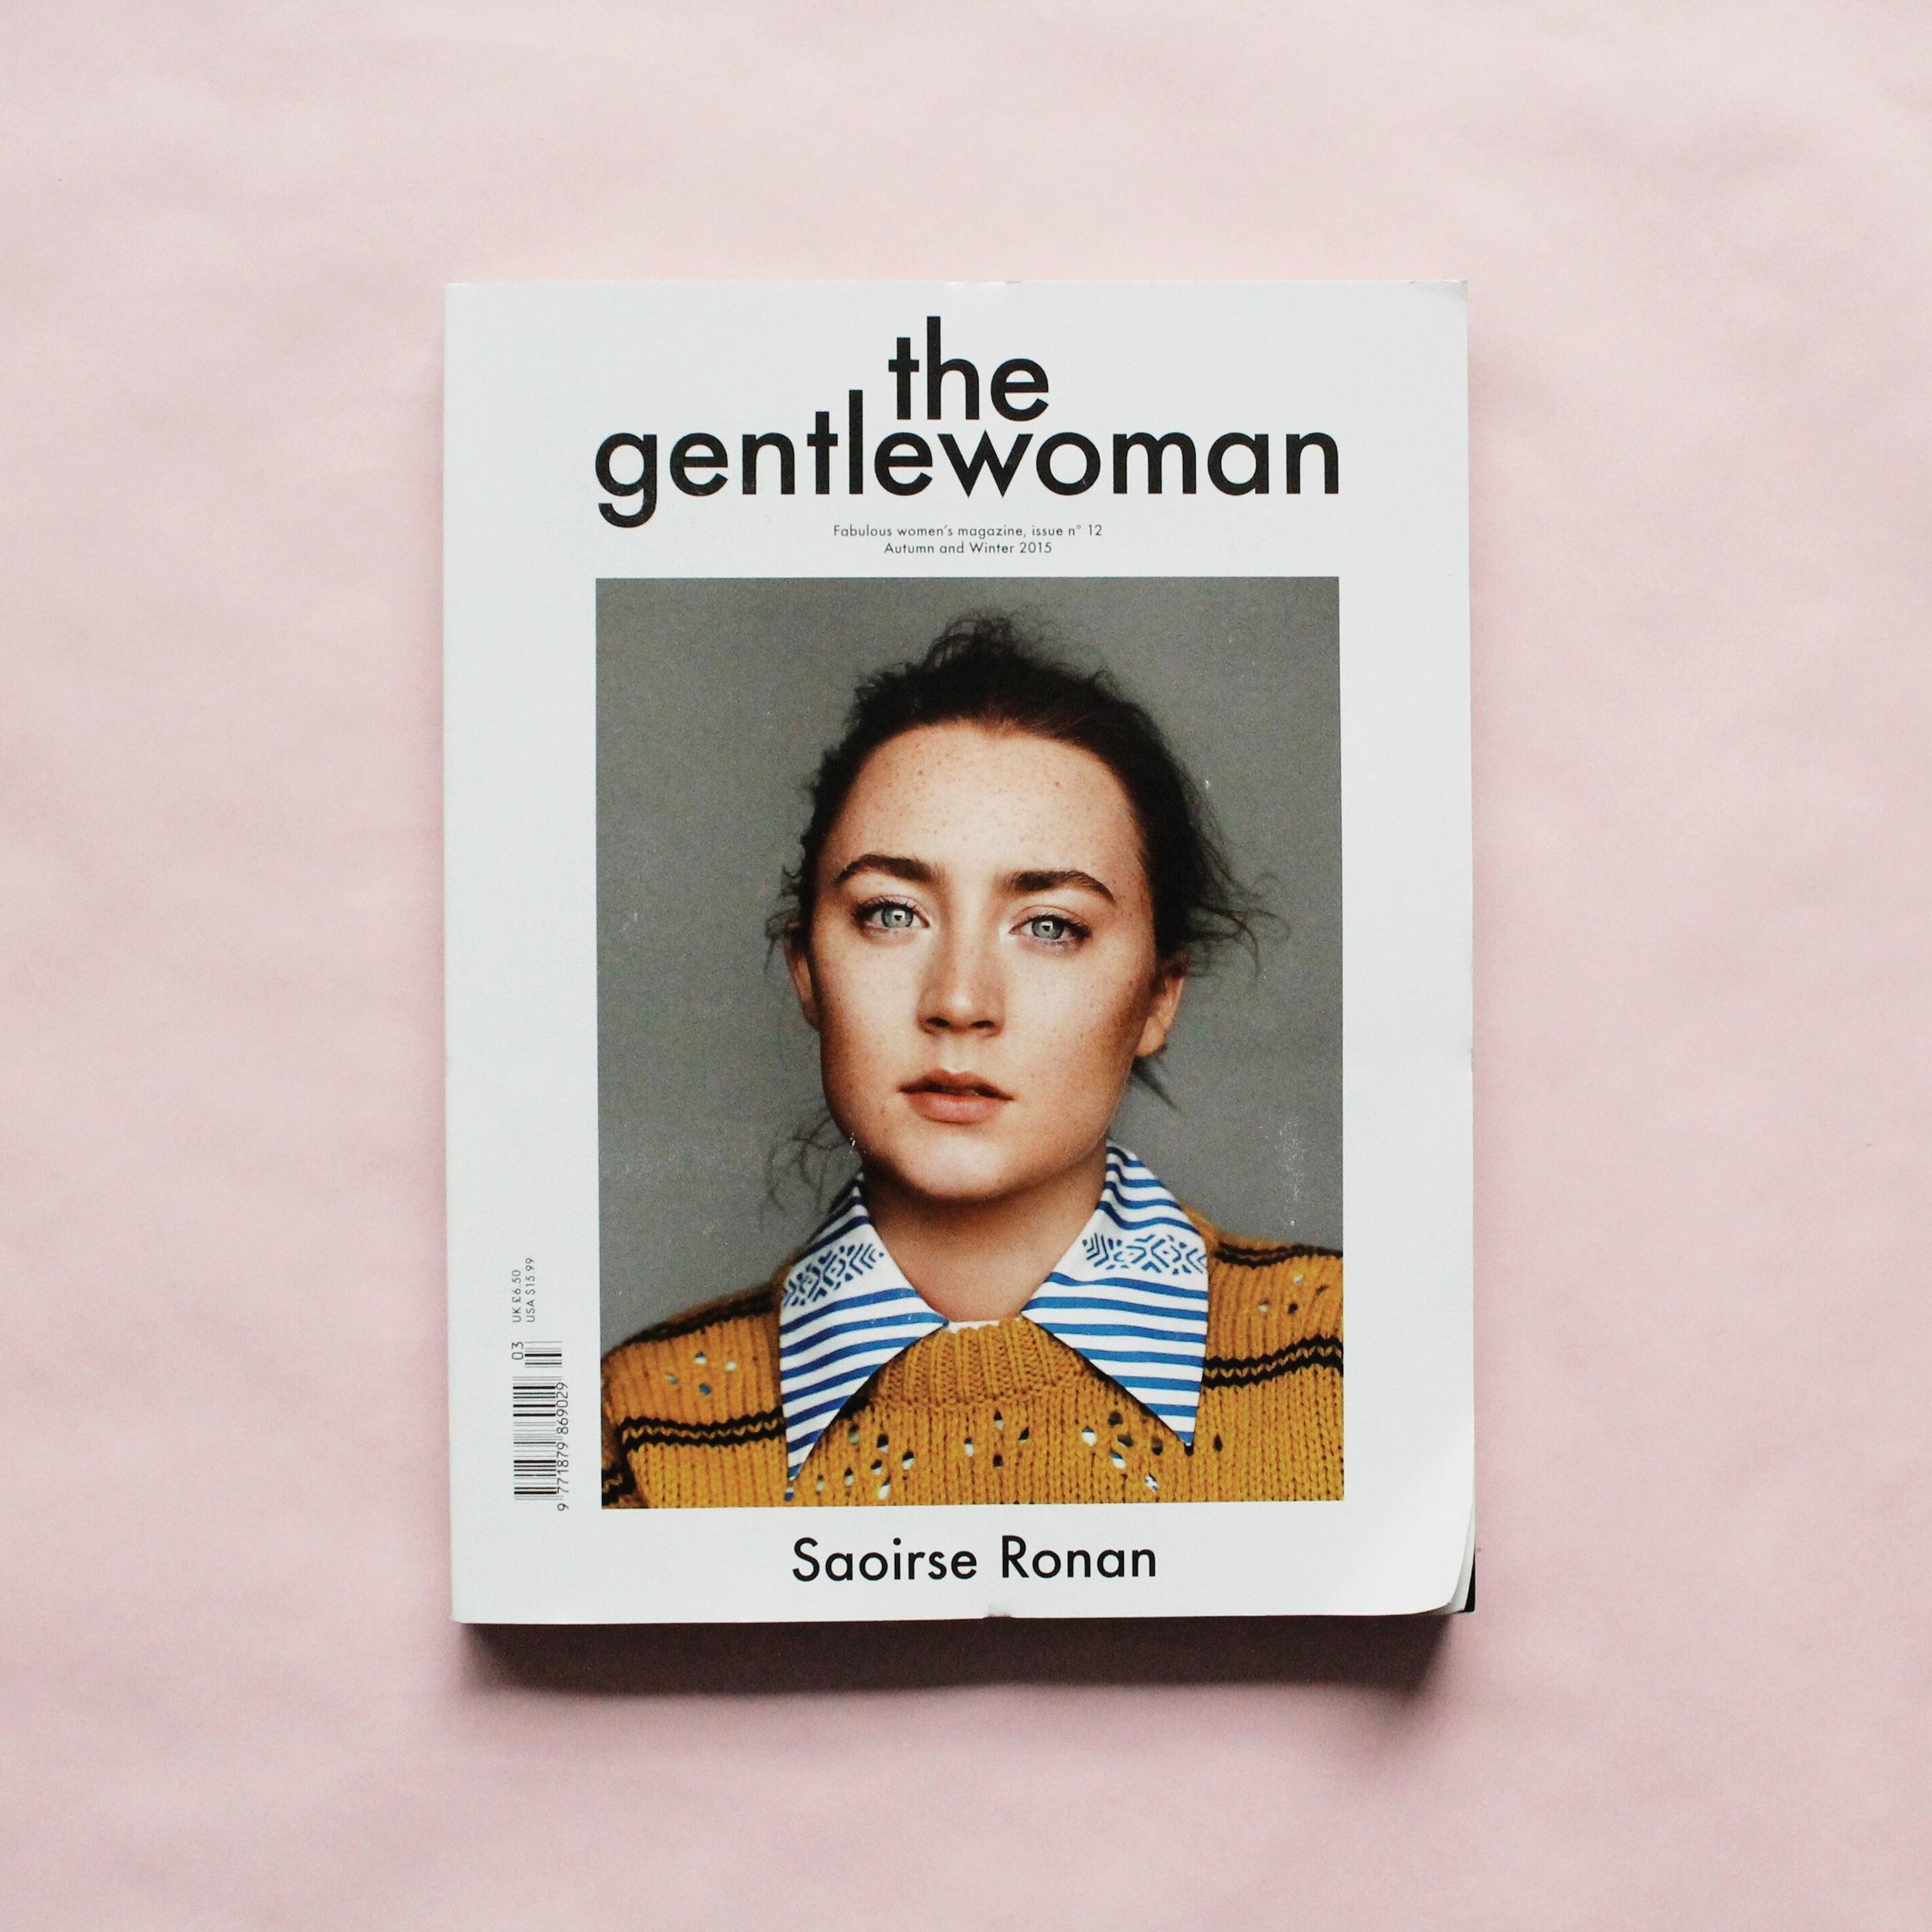 The Gentlewoman x Bodega LTD